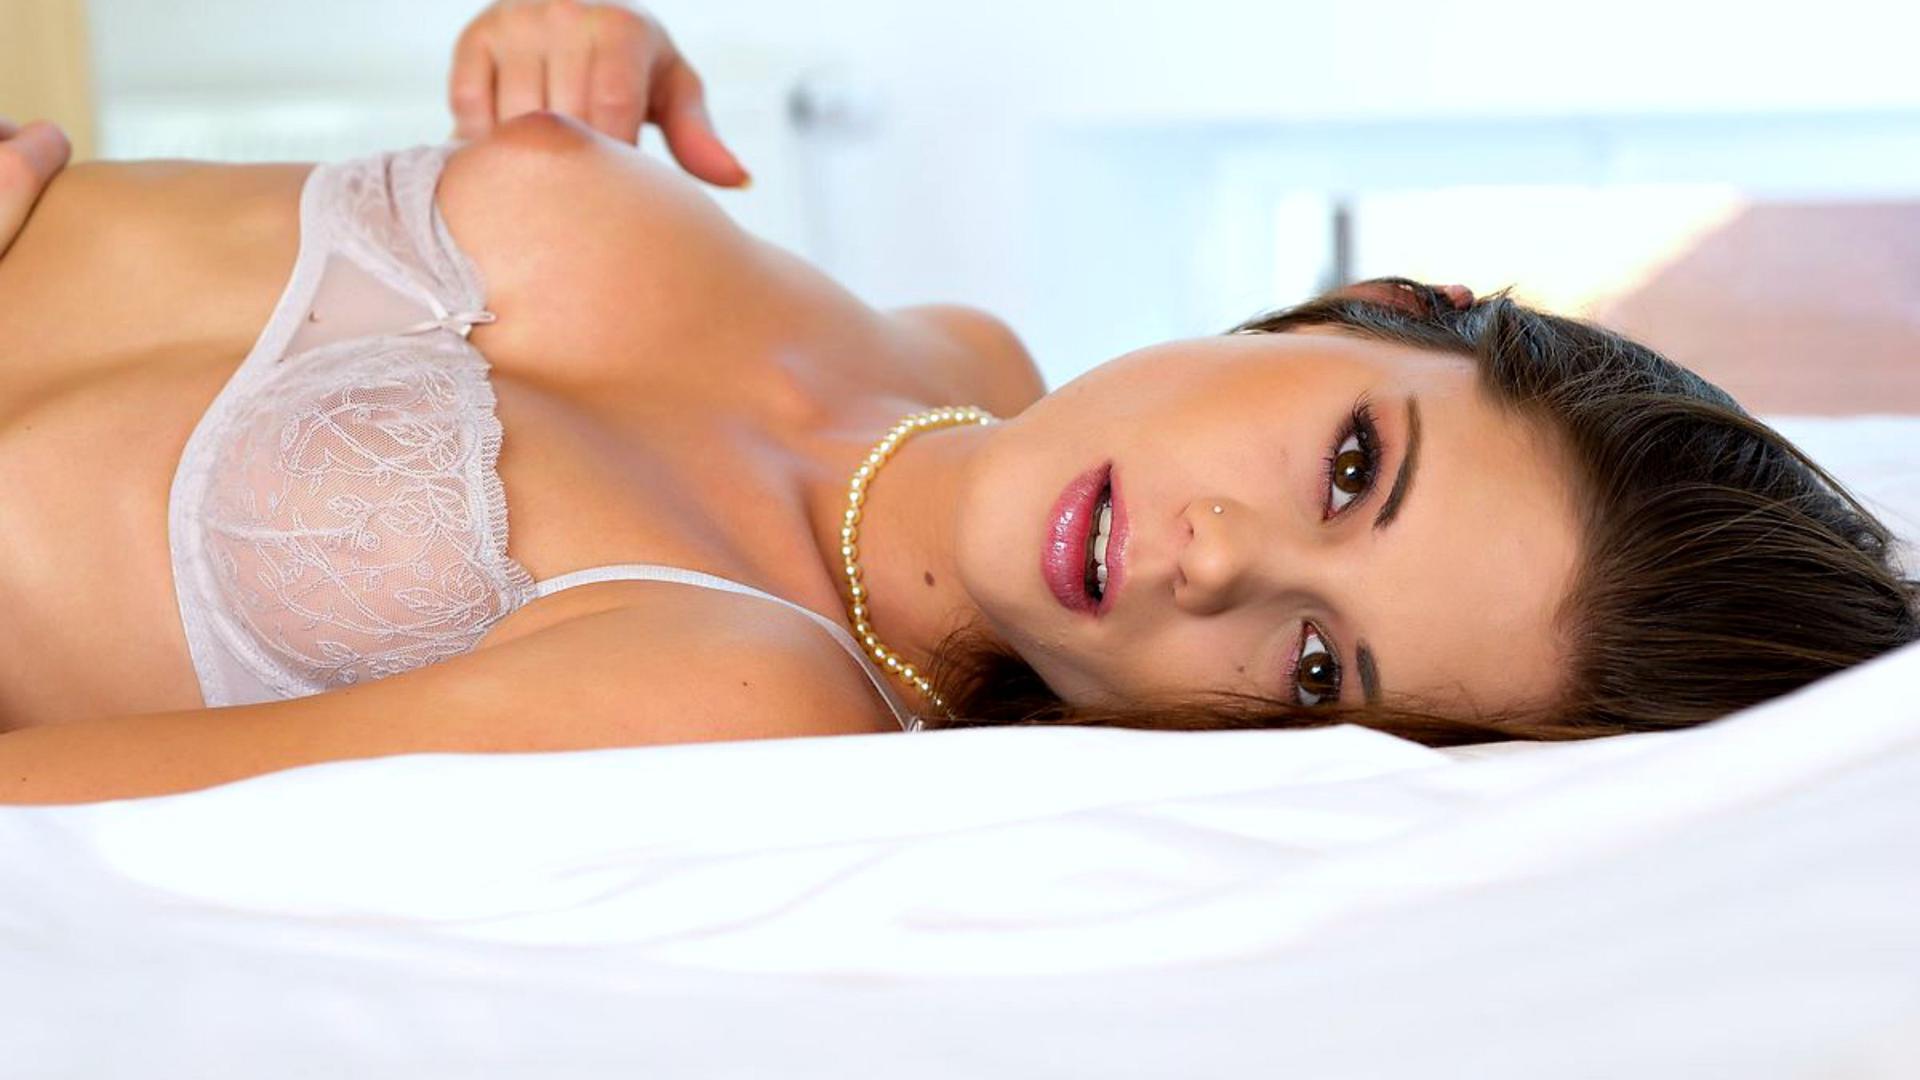 Download photo 1920x1080, caprice, brunette, lingerie, bra